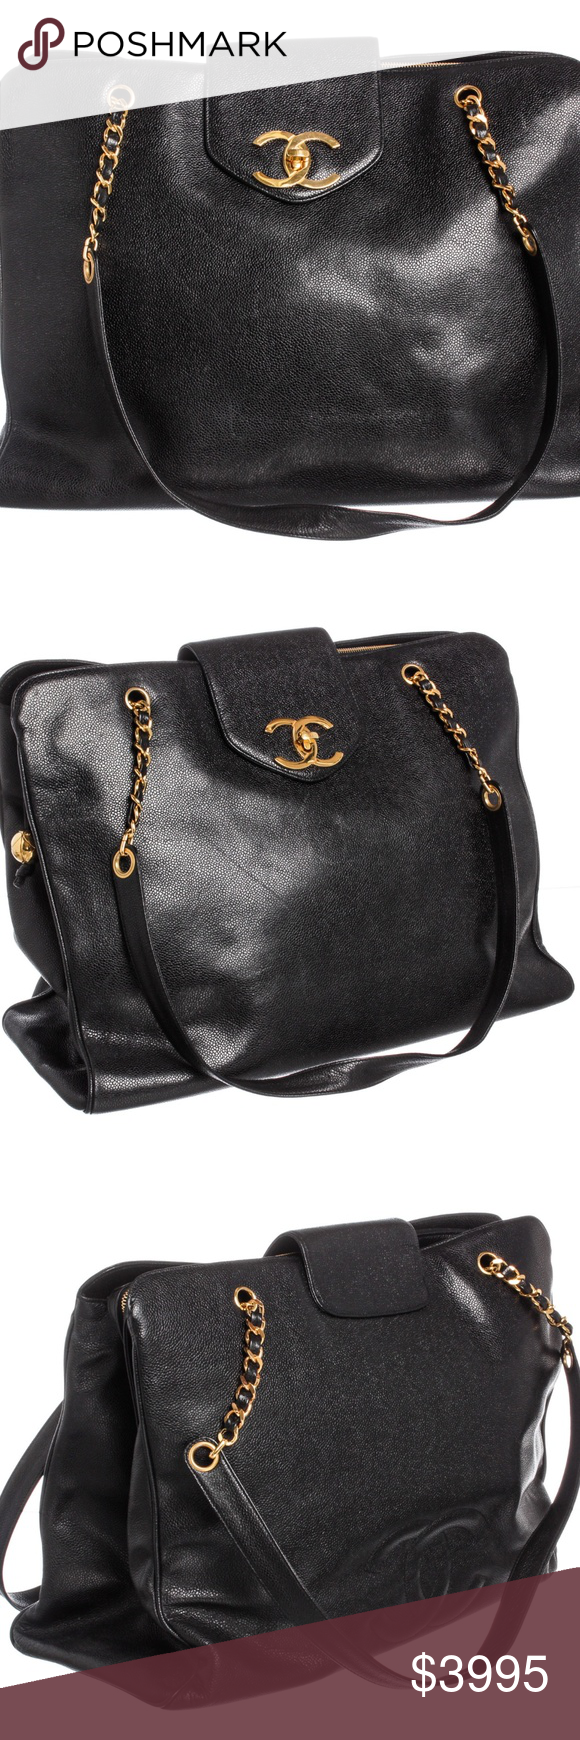 cbb7d2b120b5a4 Chanel Black Caviar Vintage Supermodel Tote Bag Black Caviar leather  vintage Chanel Supermodel Tote with gold